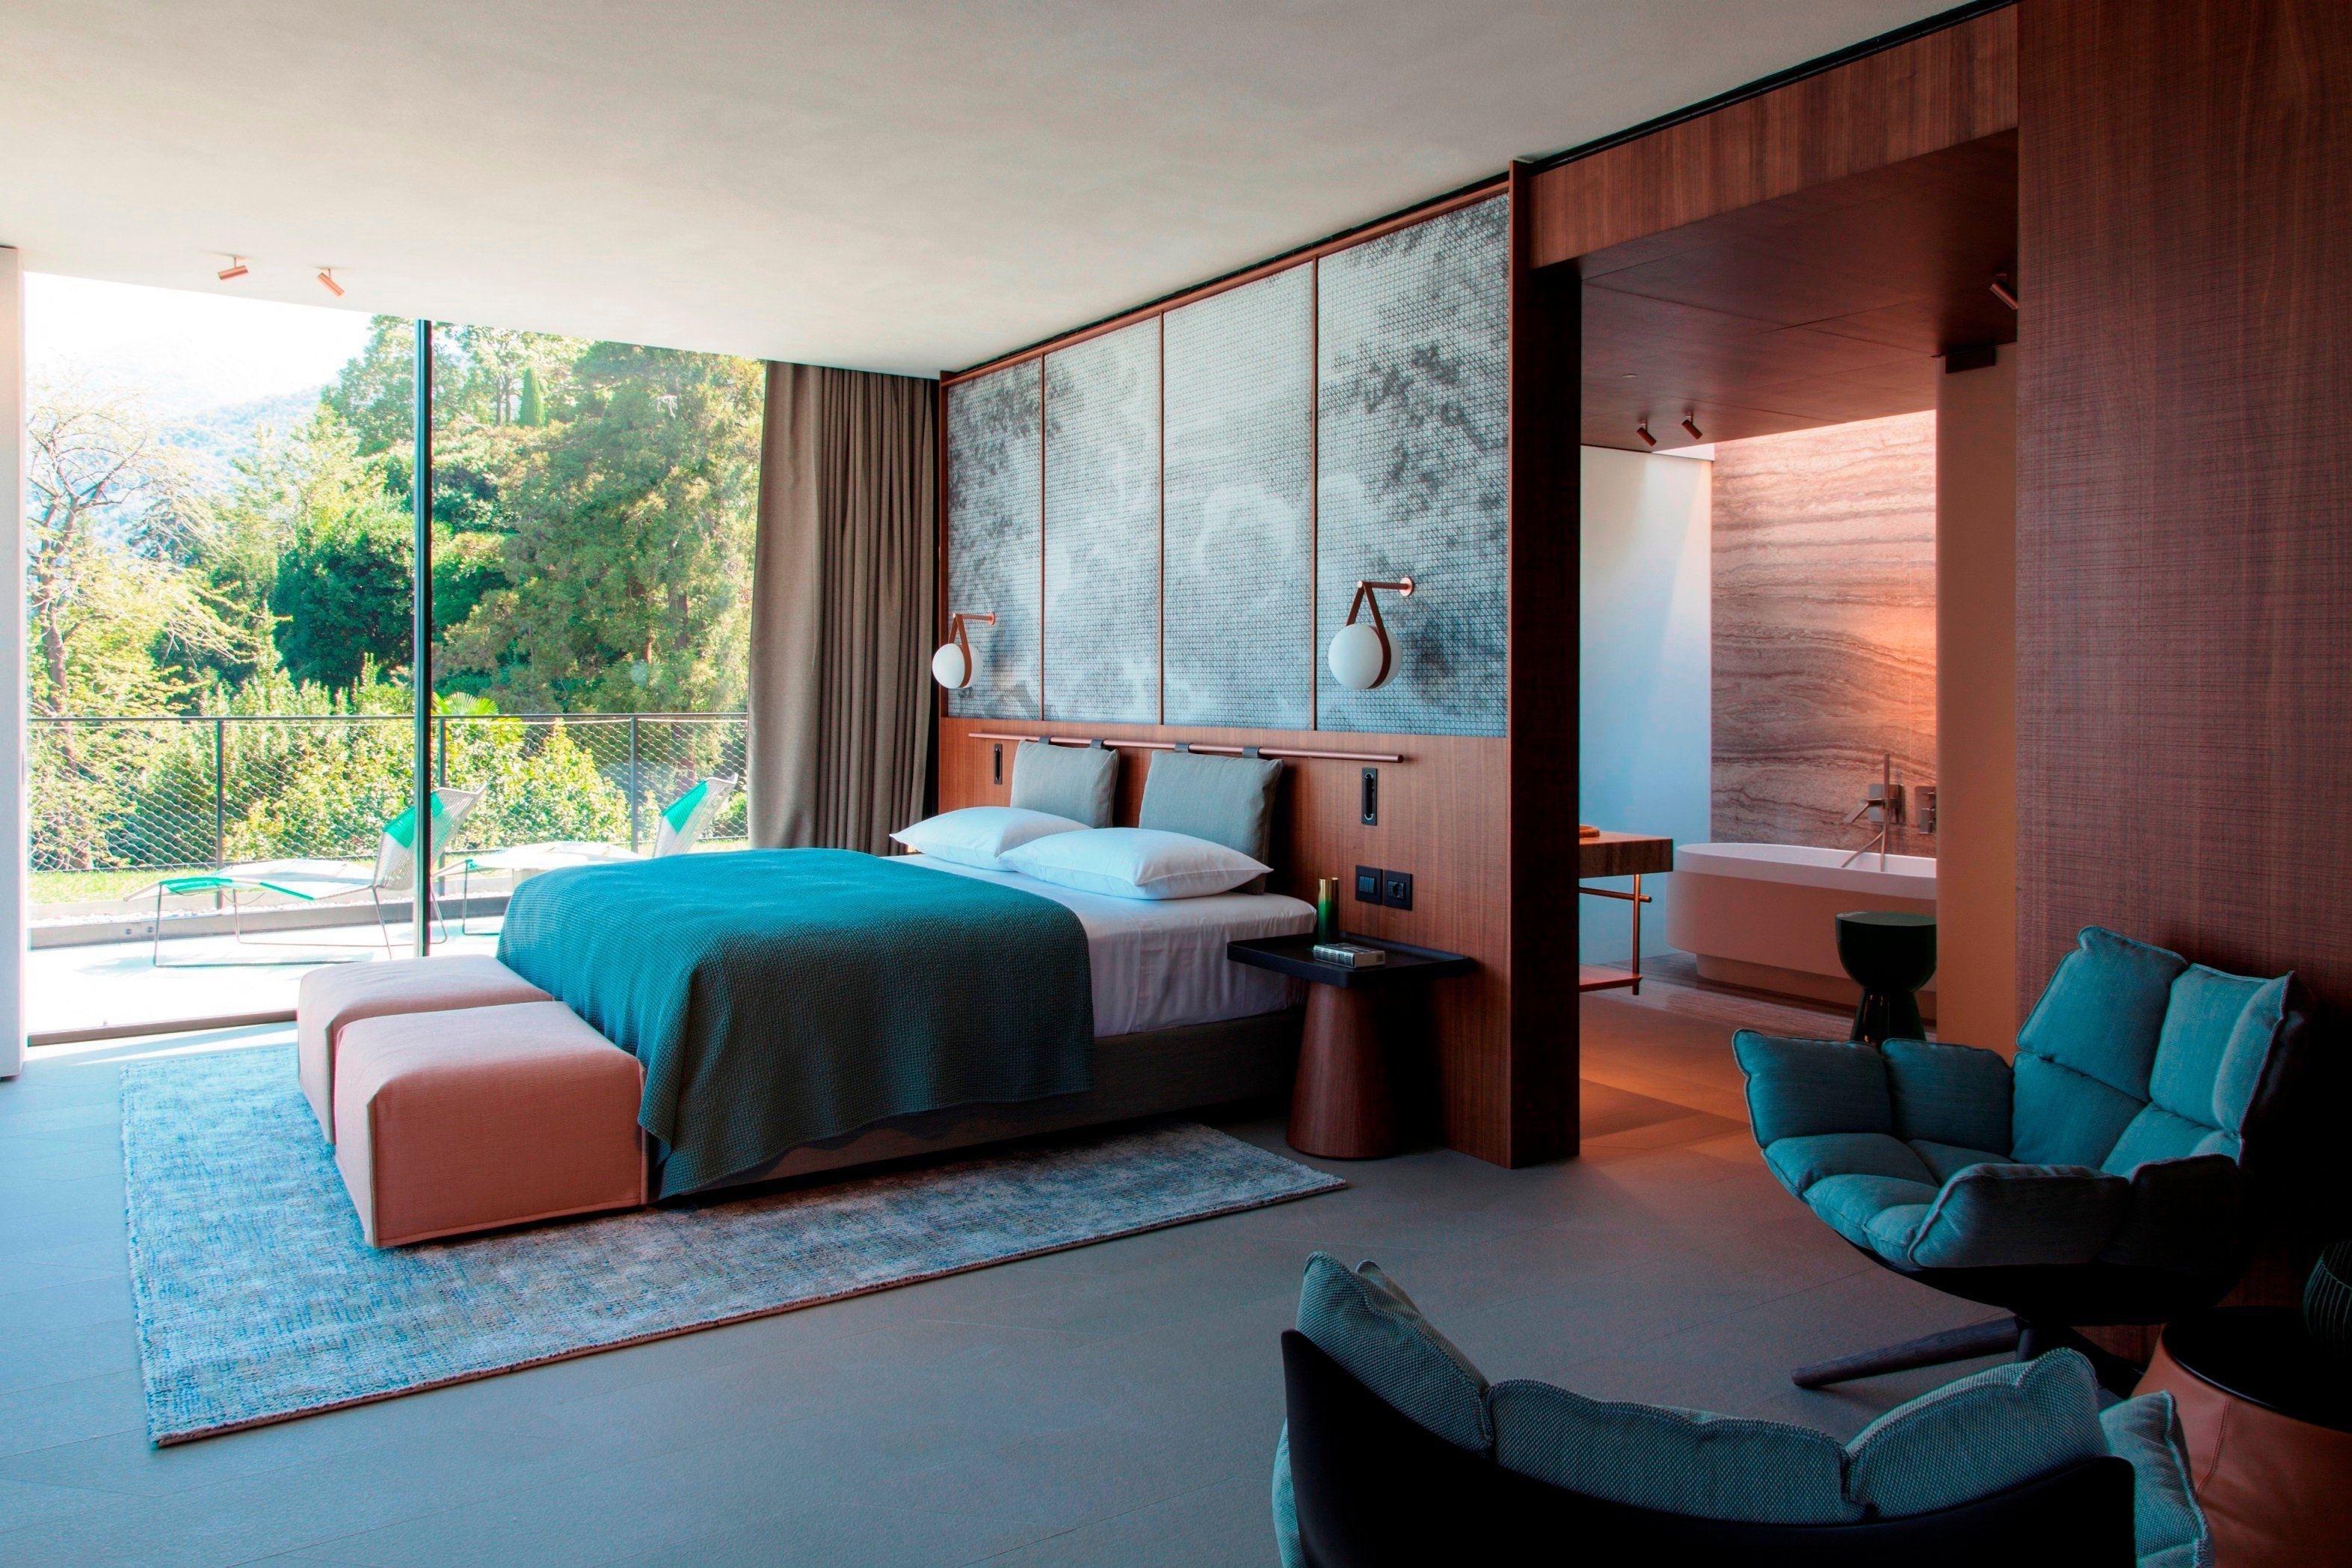 II Sereno Lago di Como (Torno, Italia) - hotel - opiniones y comentarios - TripAdvisor